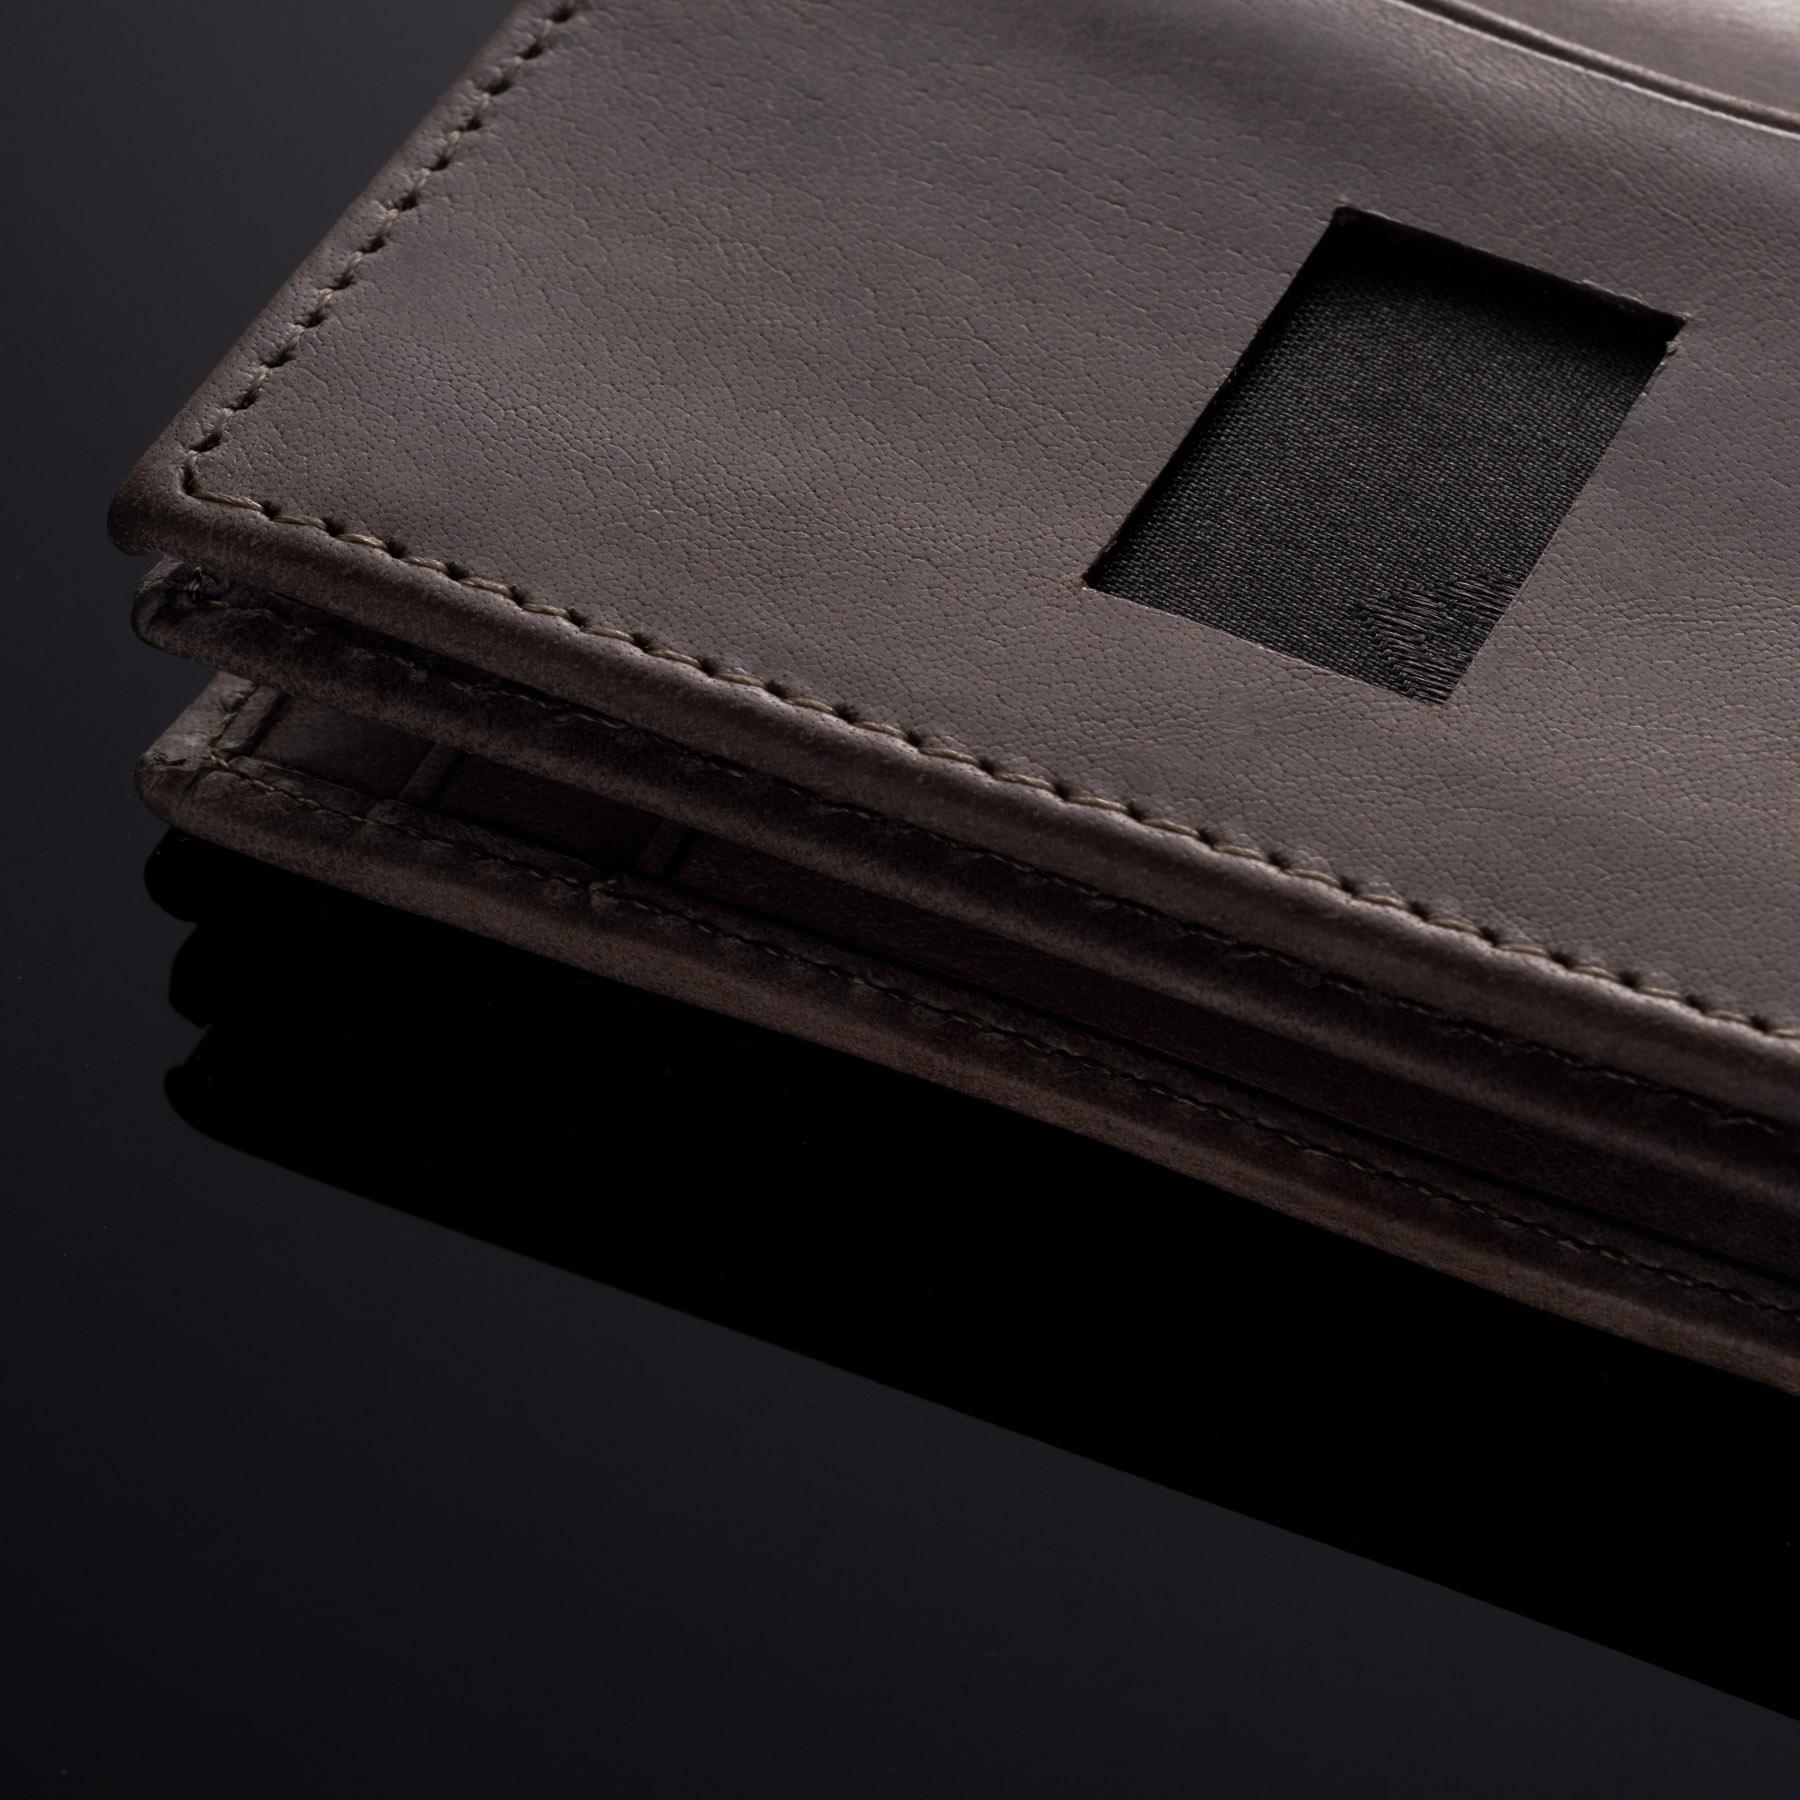 Alpine-Swiss-RFID-Leather-Business-Card-Wallet-Minimalist-ID-Window-Card-Holder thumbnail 44